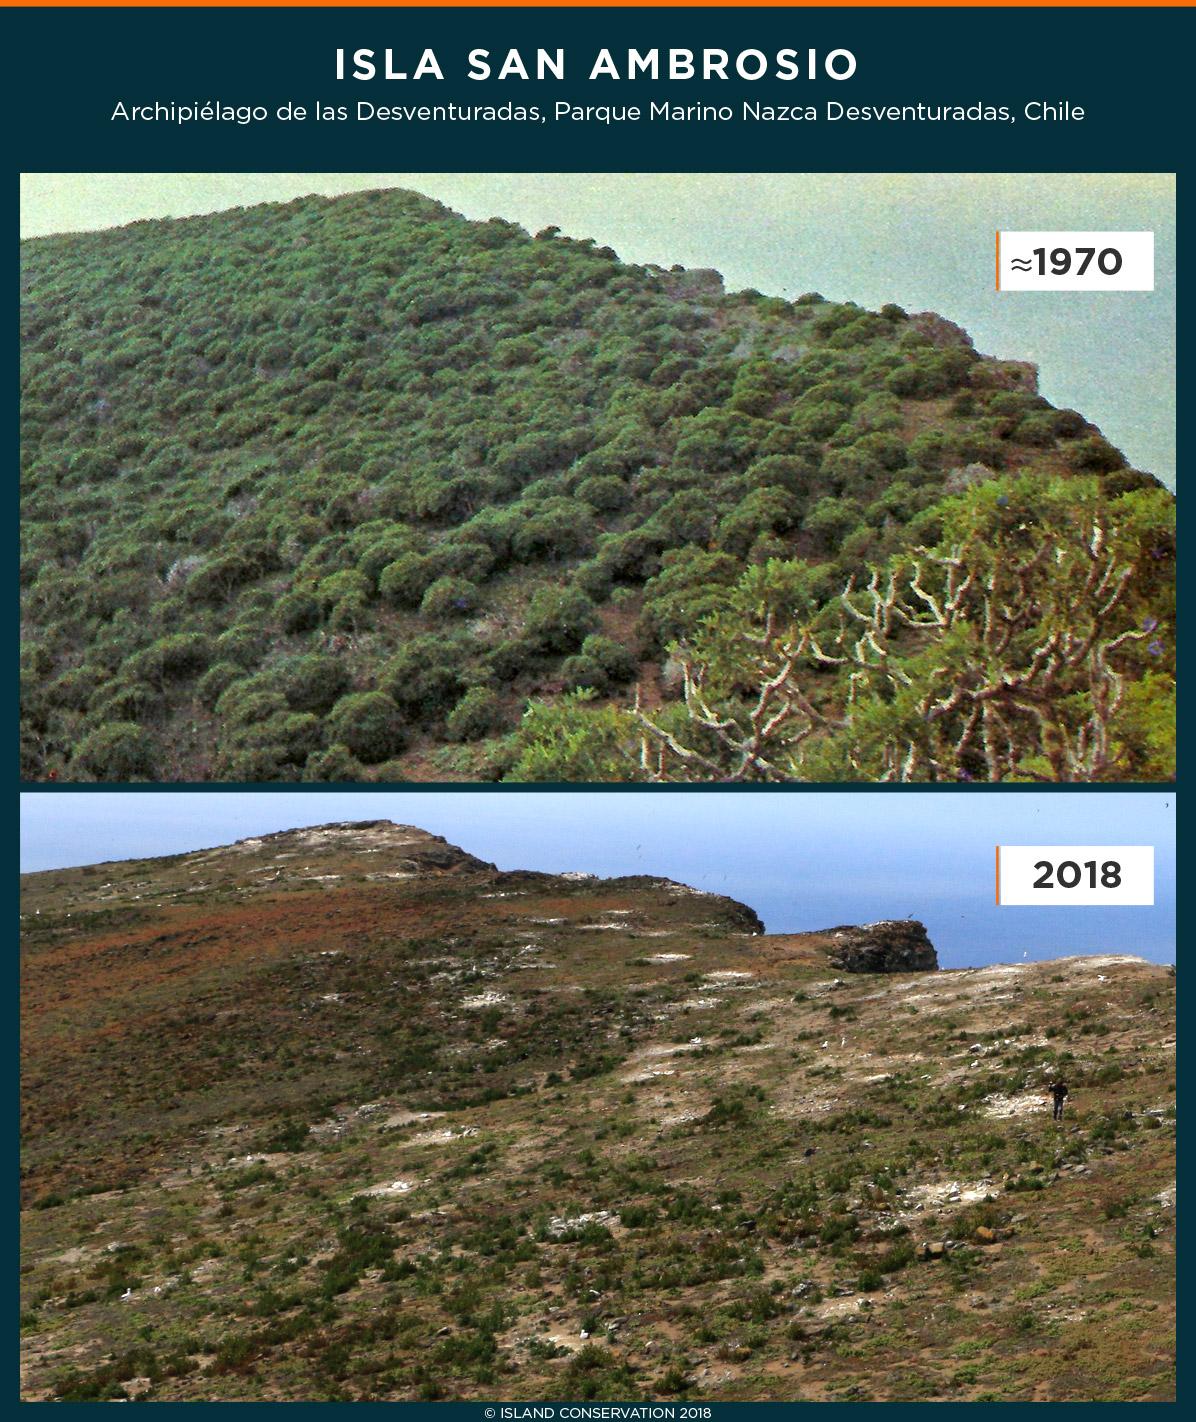 island conservation desventuradas archipielago chile san ambrosio thamnoseris lacerata